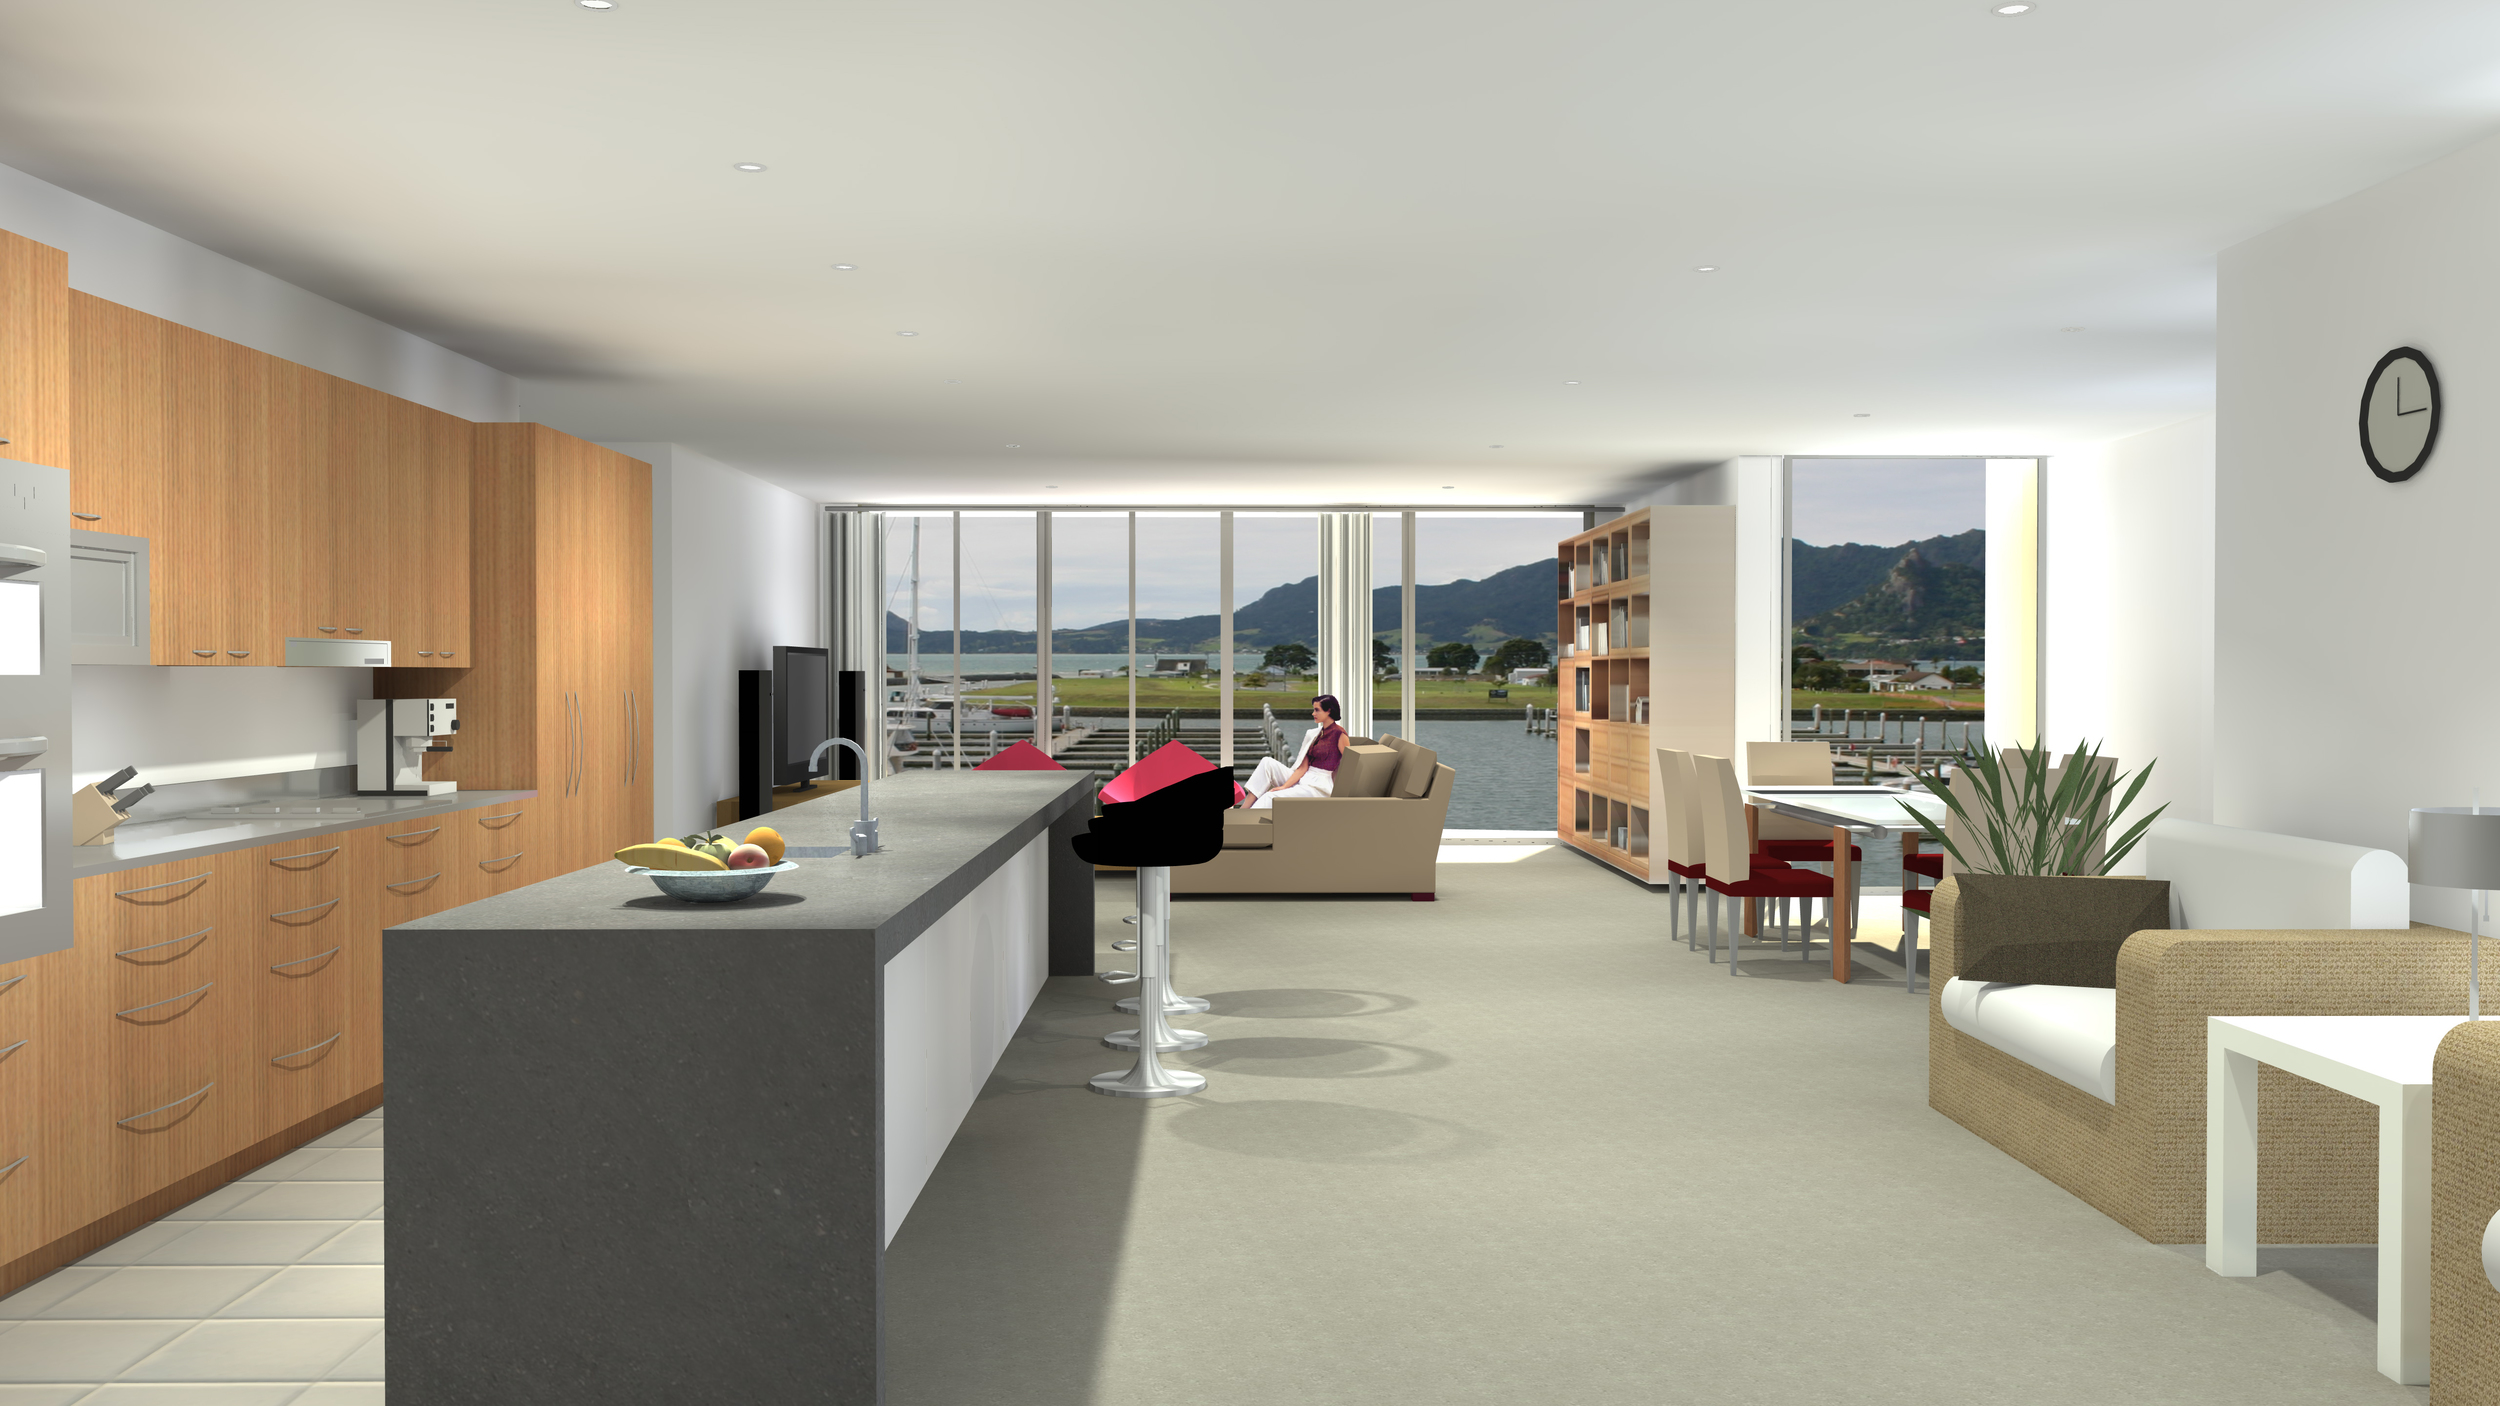 Apartment Image 1.jpg